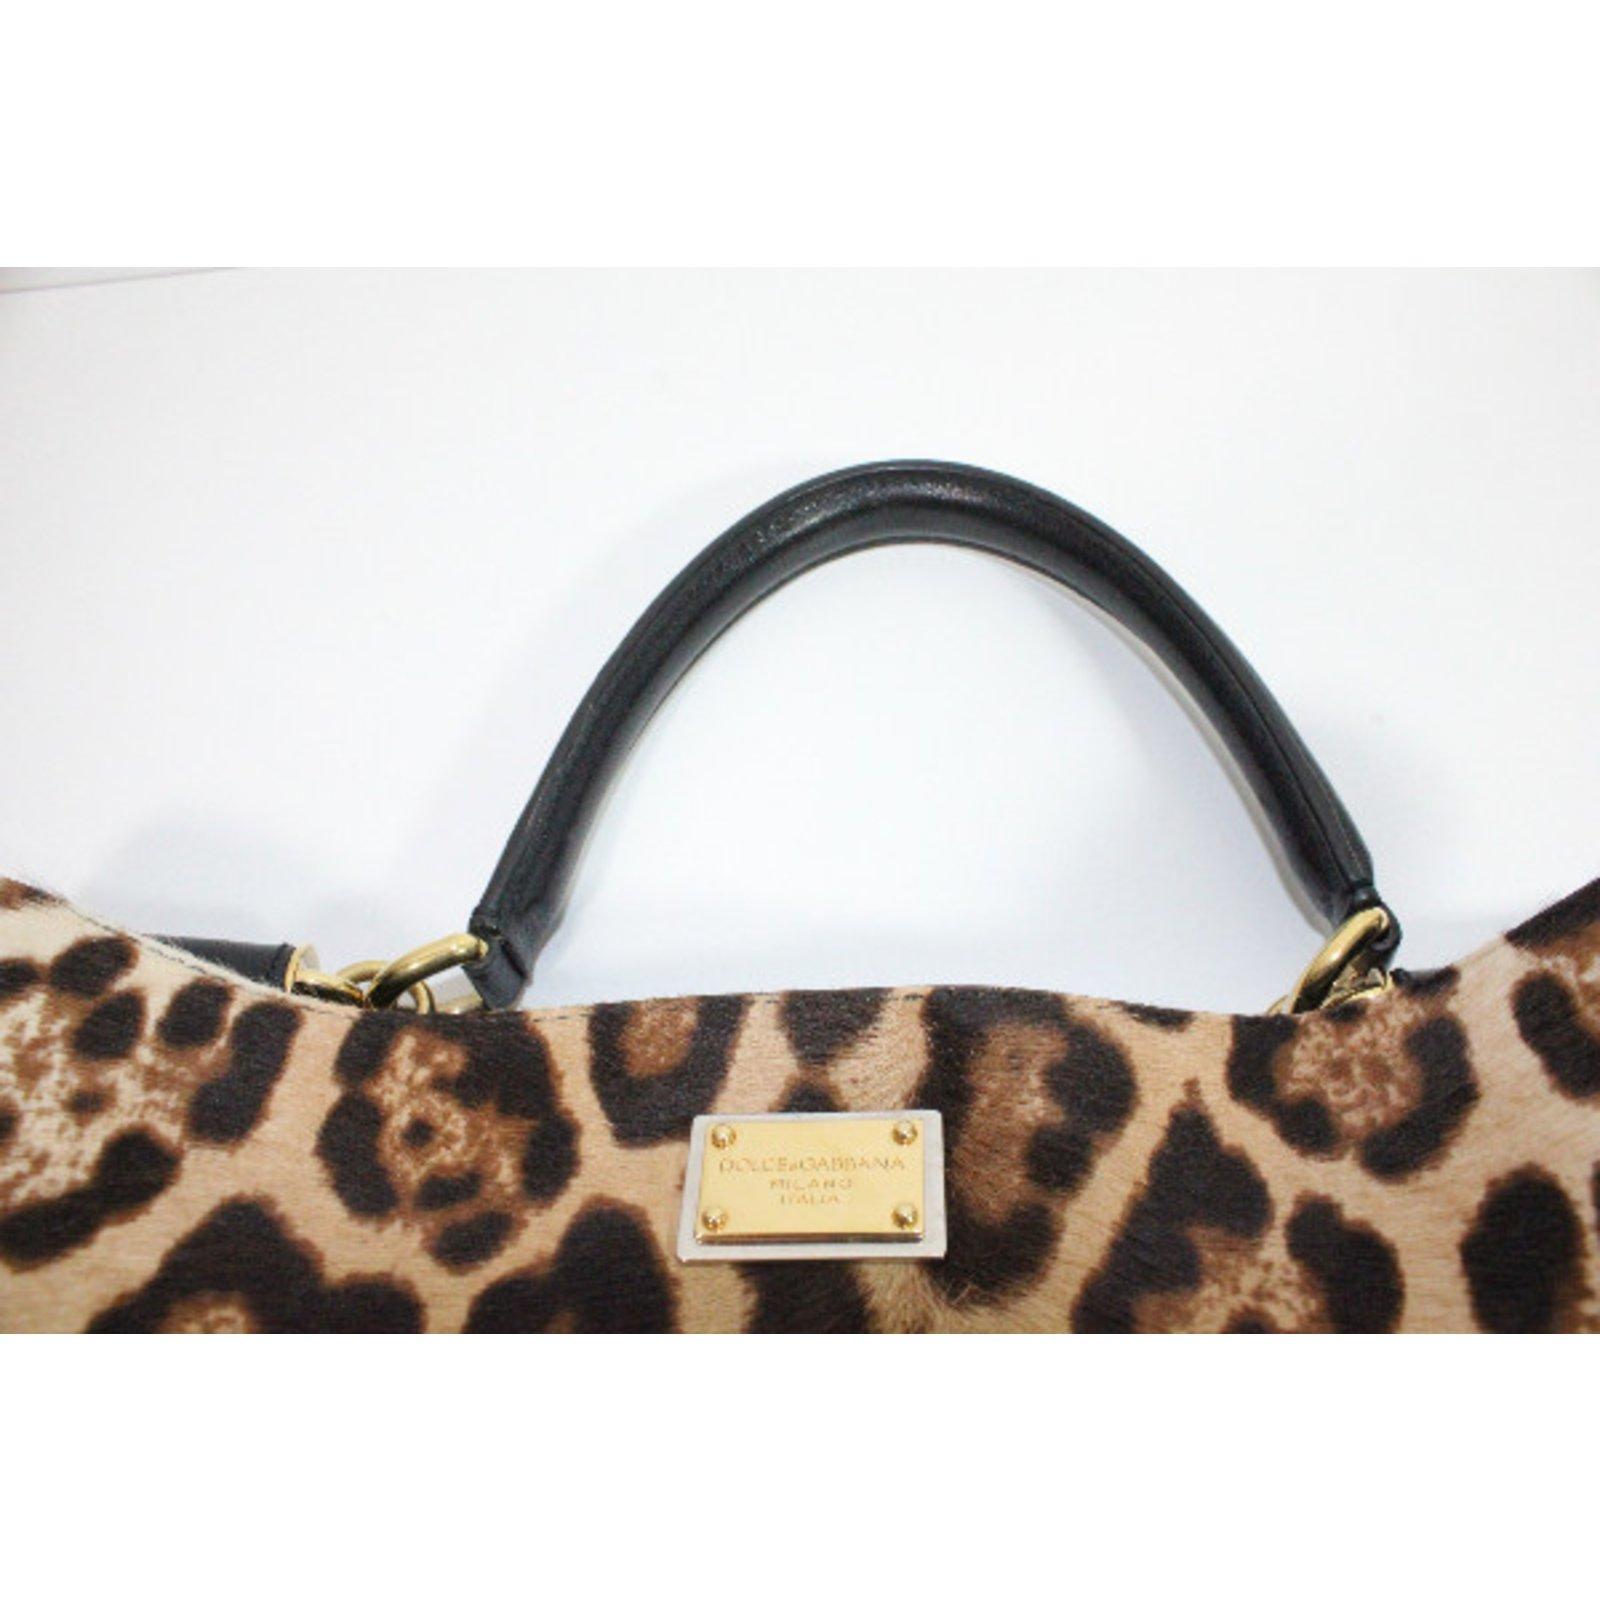 f9a59e986f Facebook · Pin This. Dolce   Gabbana Handbag Handbags Other Leopard print  ref.30295